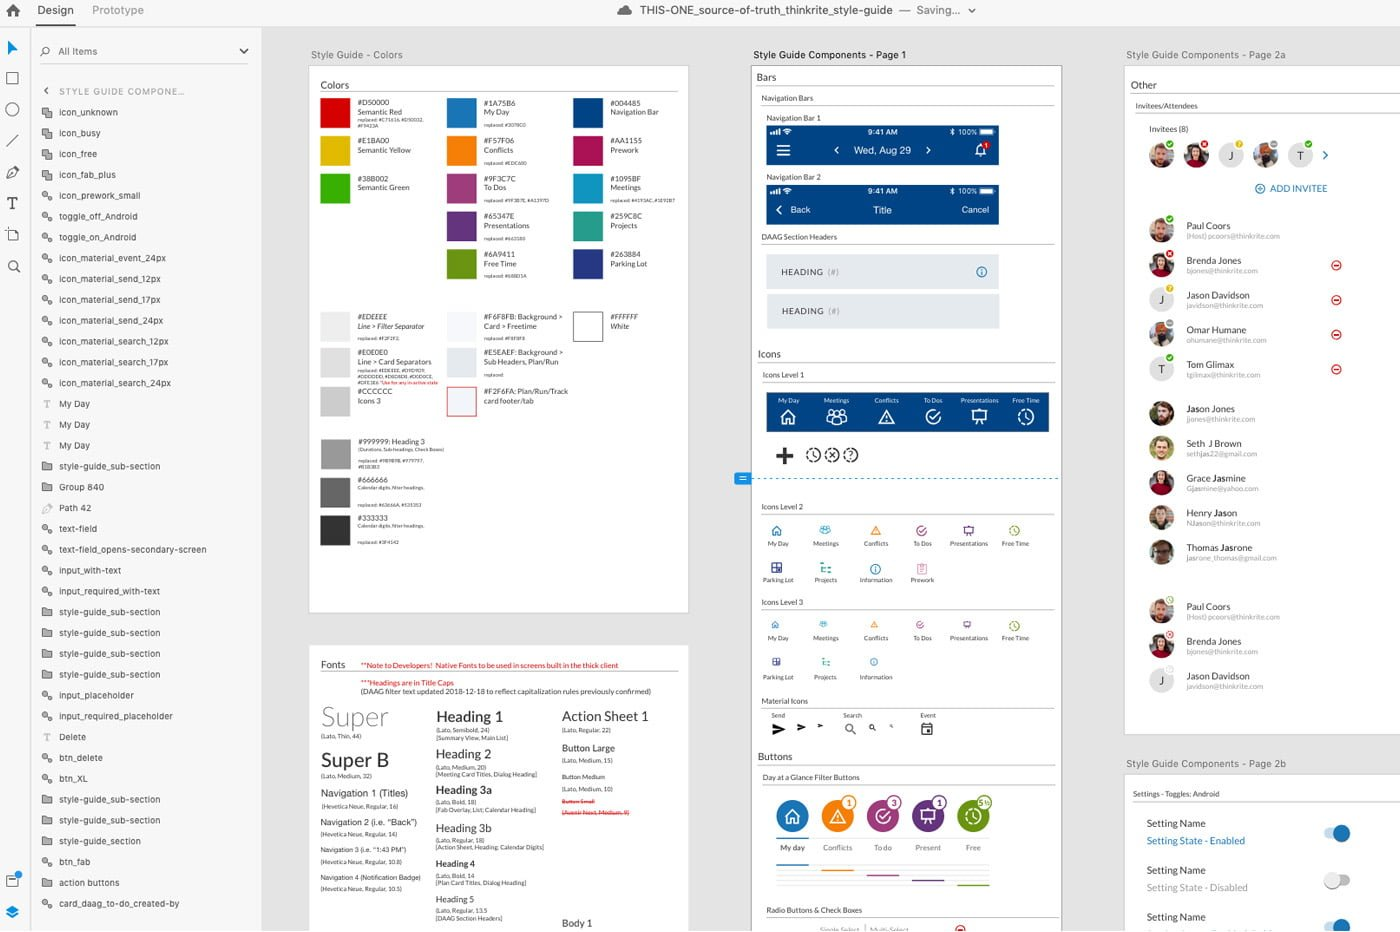 Design Systems Adobe XD 2019